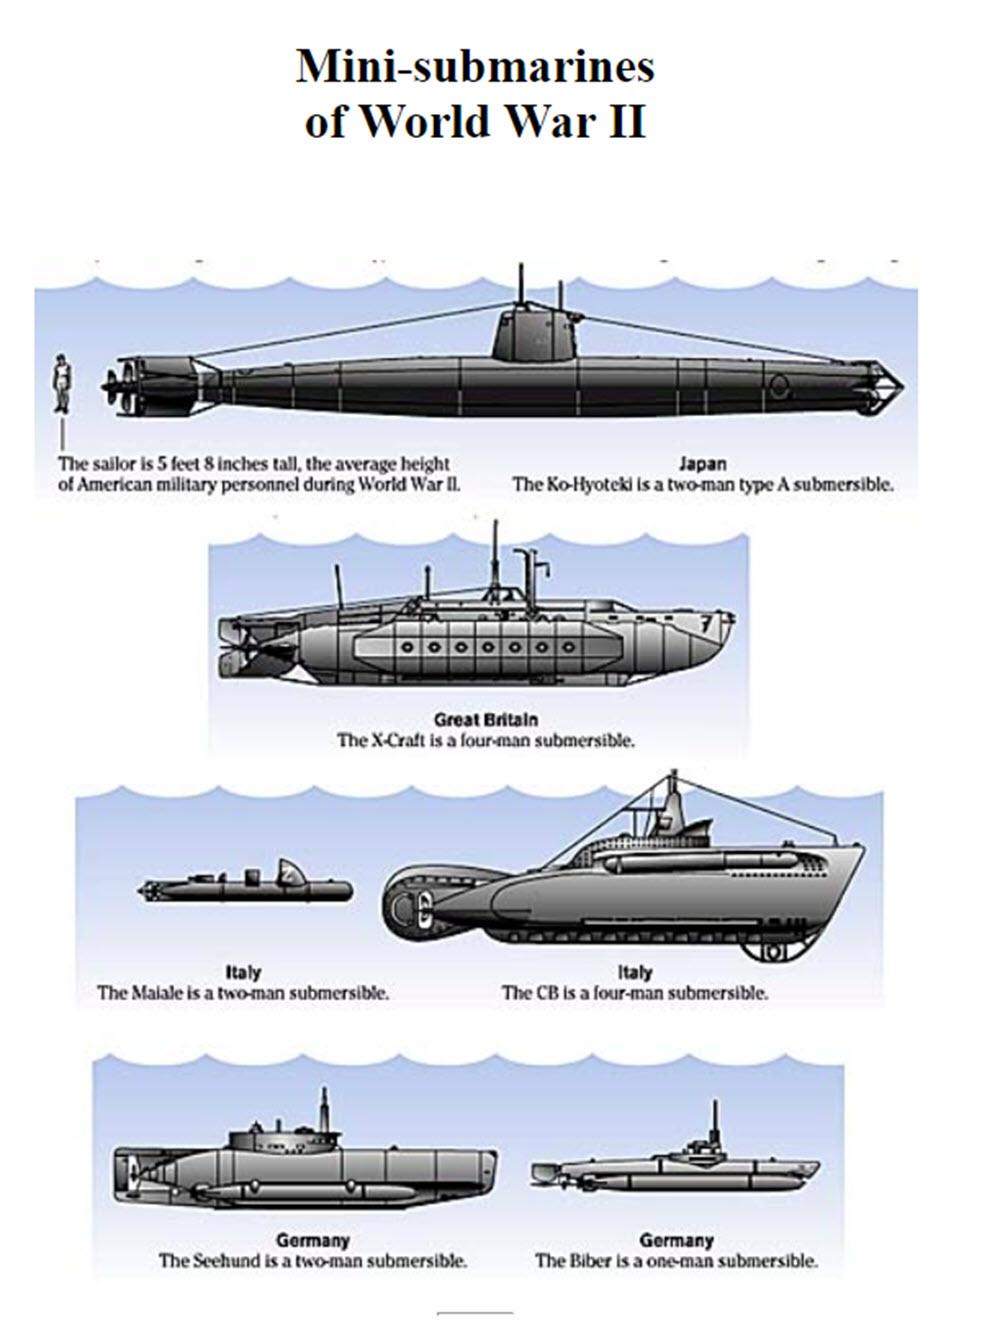 Hunley Sous-marin américain 1863 - Page 5 2019-054